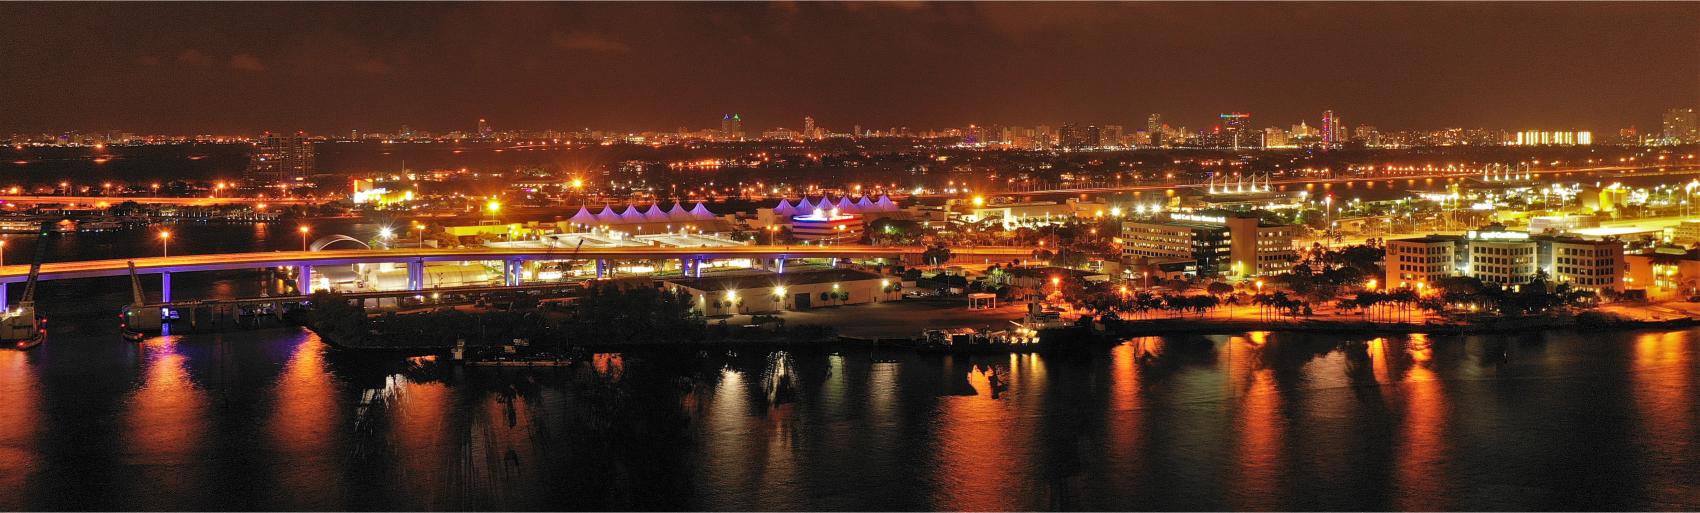 Miami_Night_11.jpg